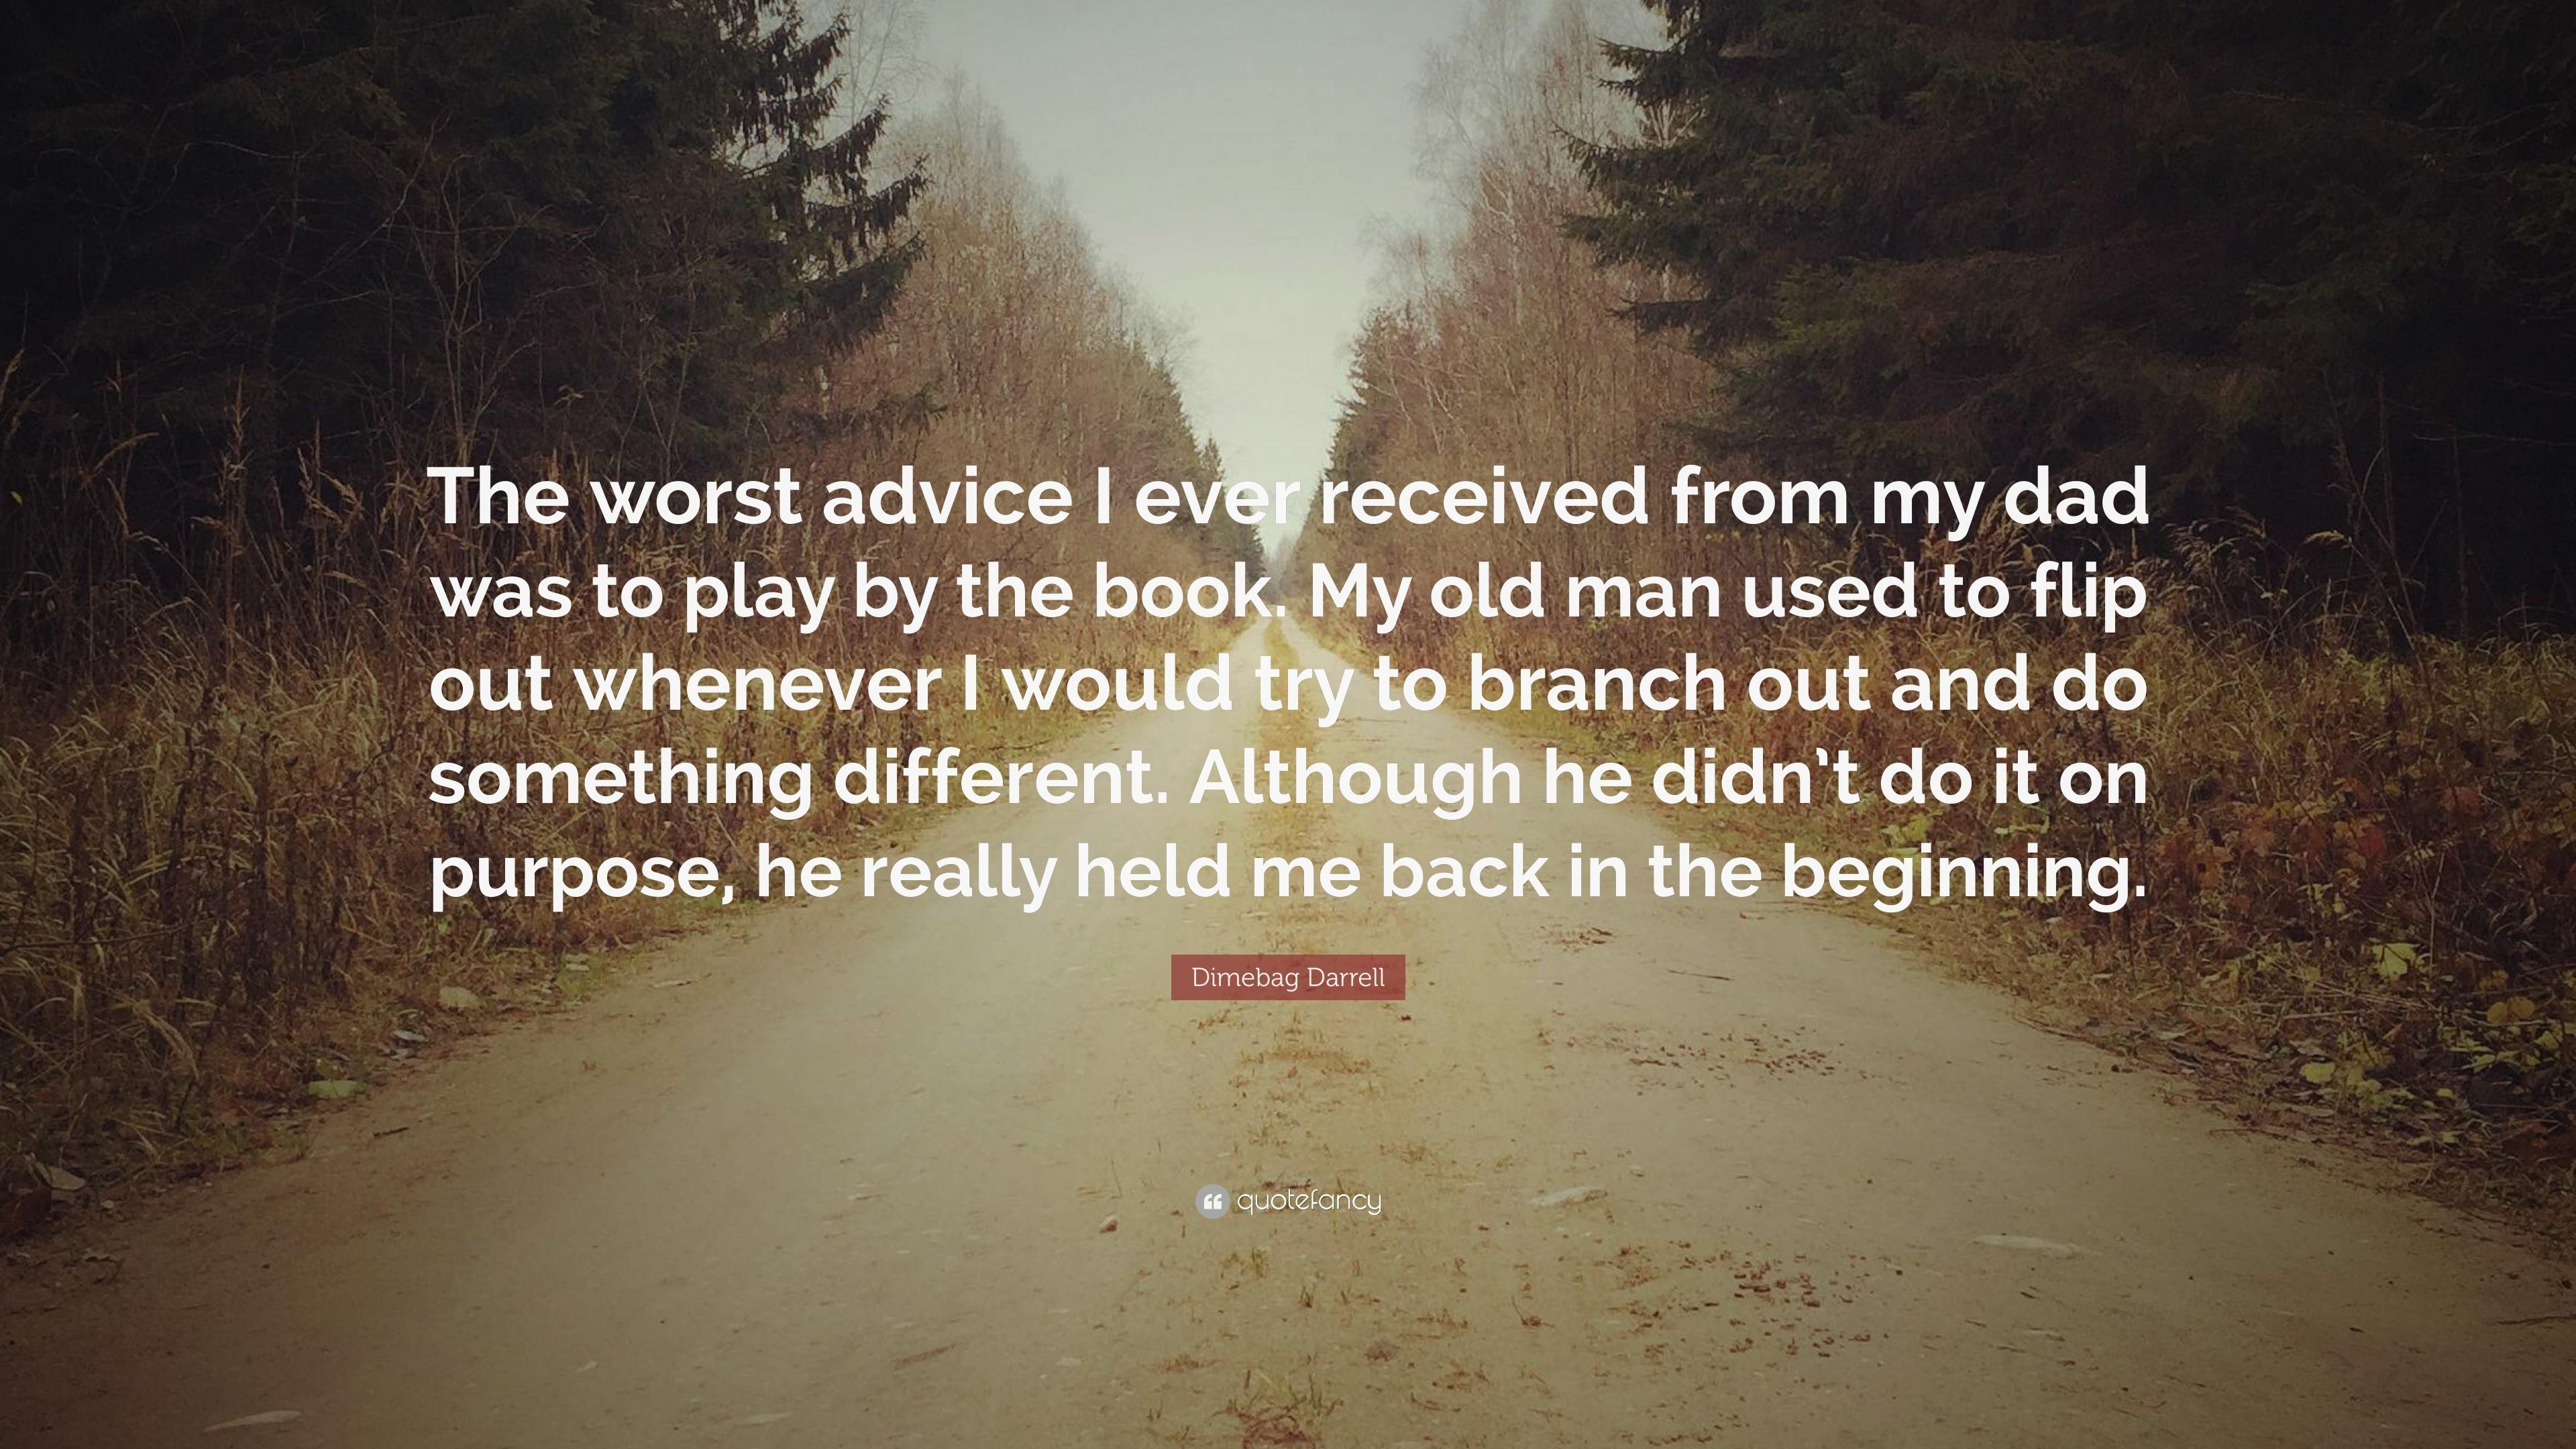 worst advice ever received